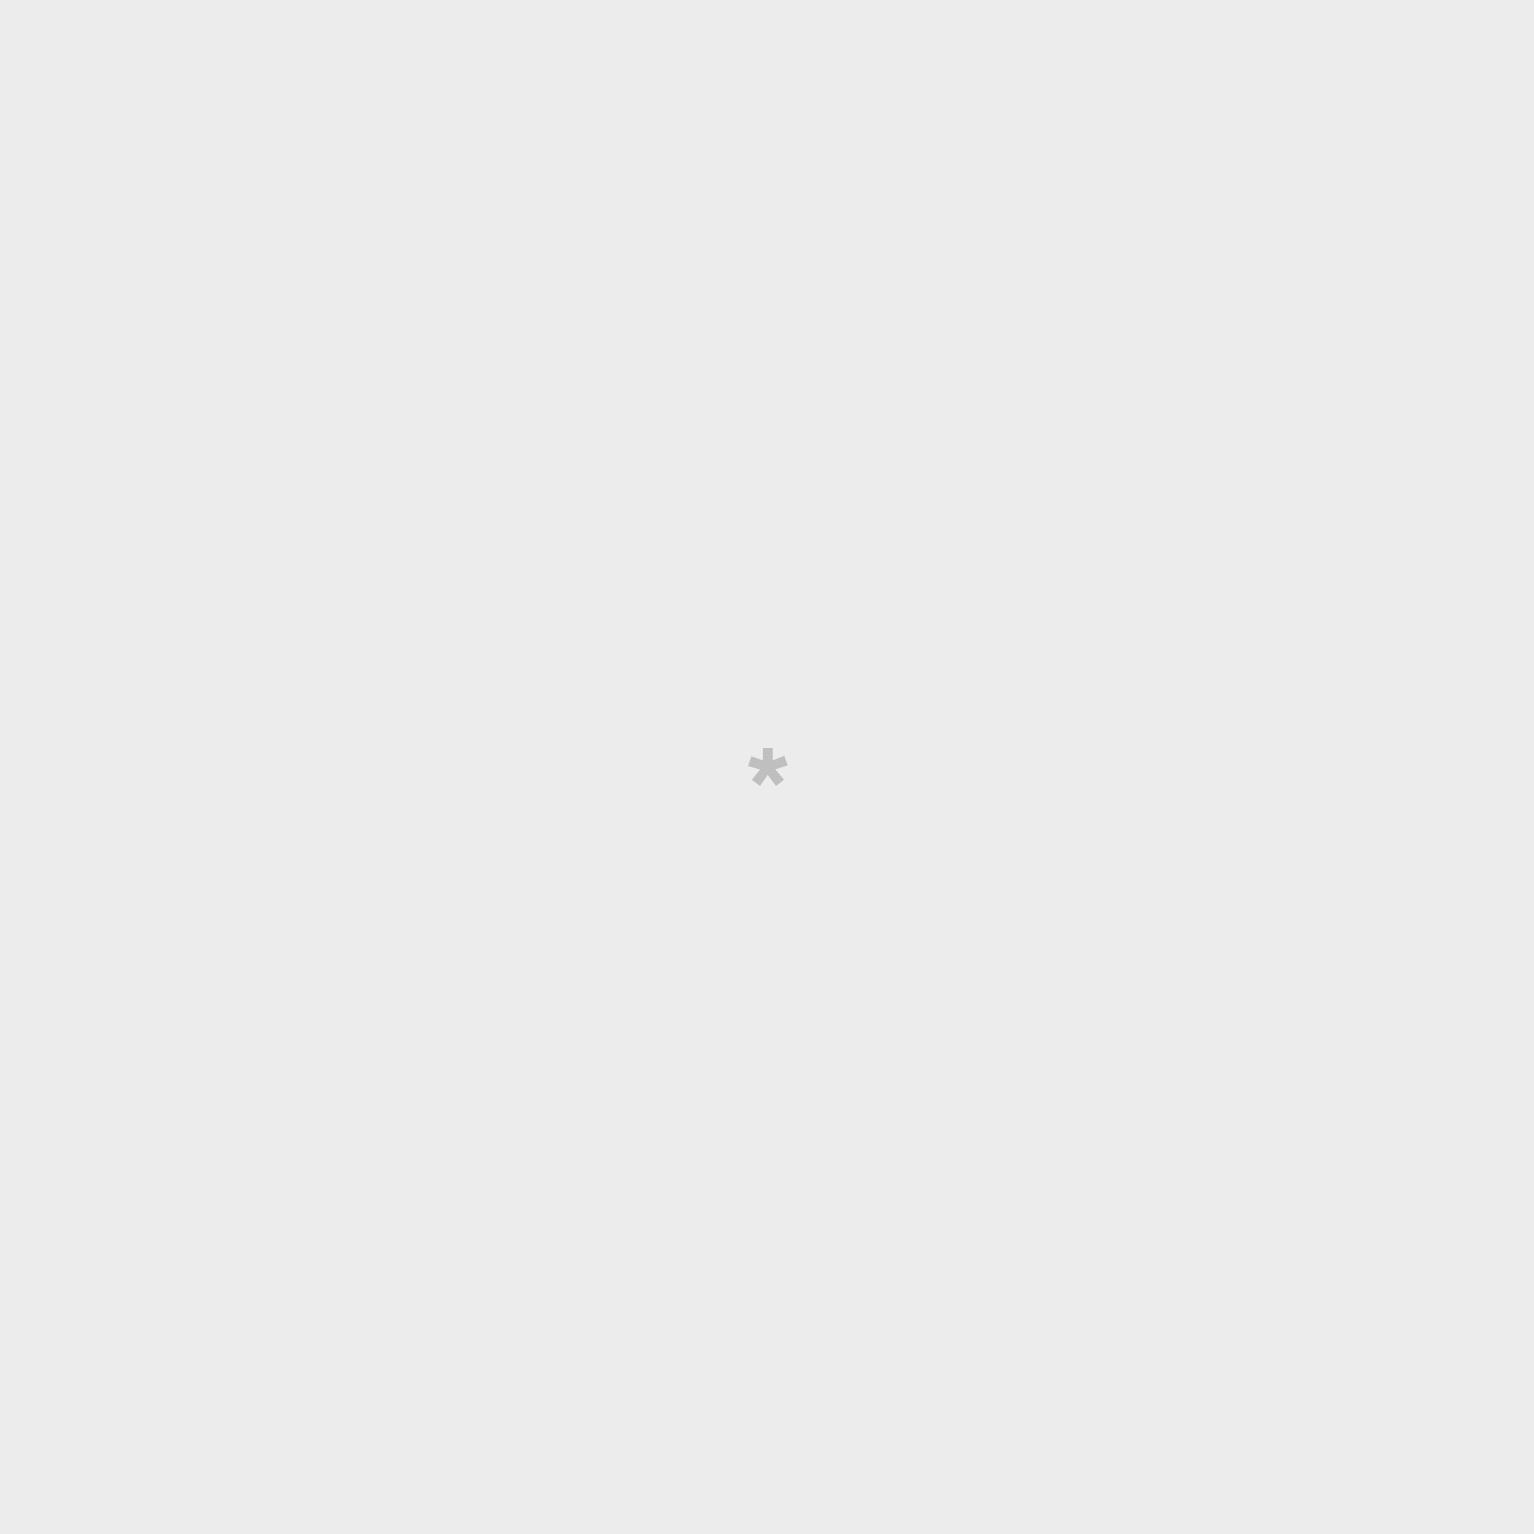 Organizador para cables - Take me away and enjoy